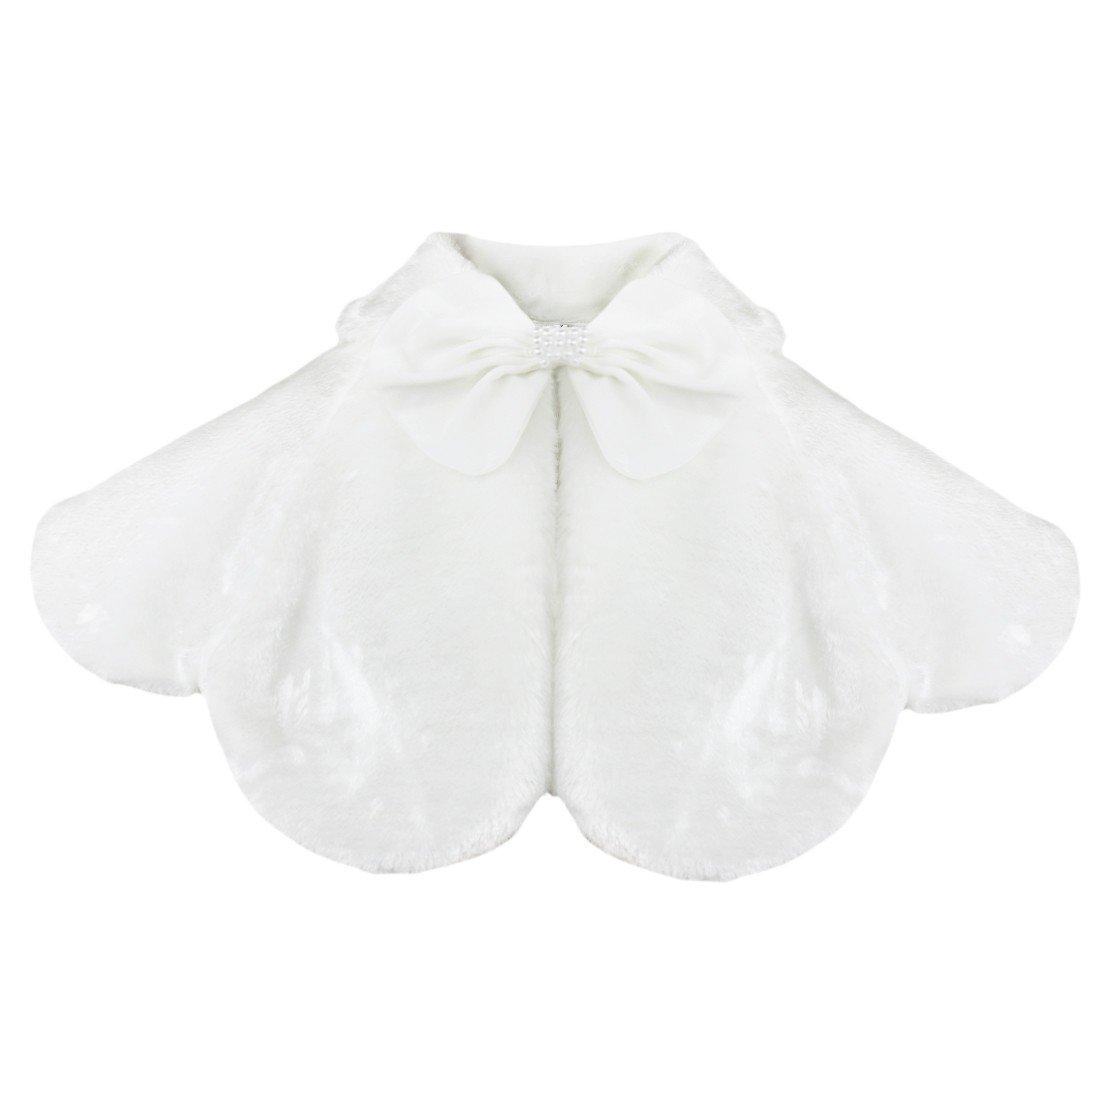 TIAOBU Girls Faux Fur Bow Bolero Wrap Shrug Jacket Wedding Party Princess Cape White 5-6